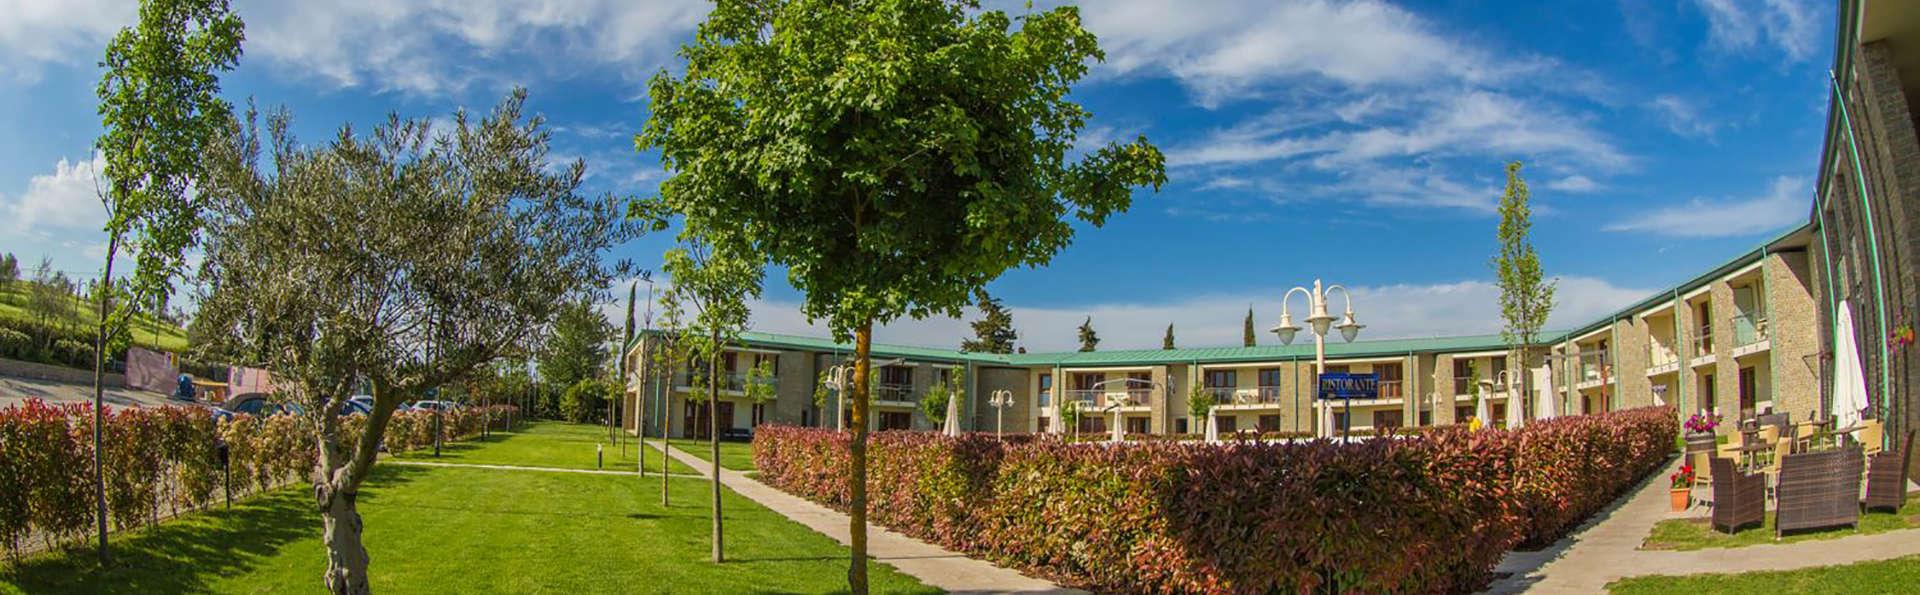 Residence Chianti Village Morrocco - Edit_Garden.jpg